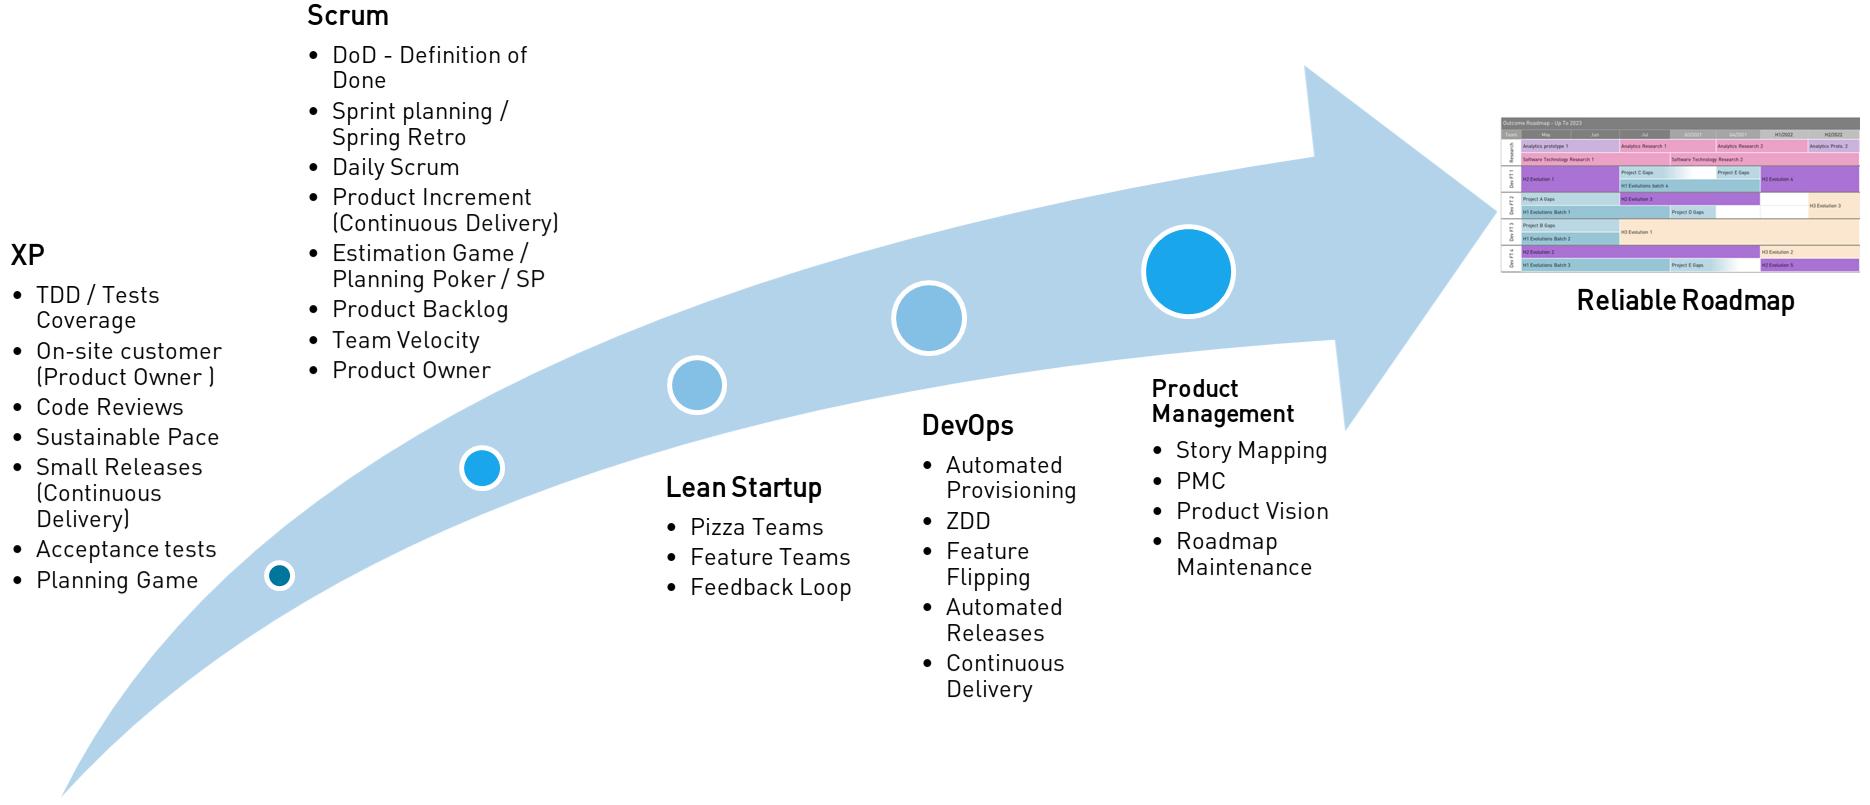 Conclusion - Agile roadmap requirements